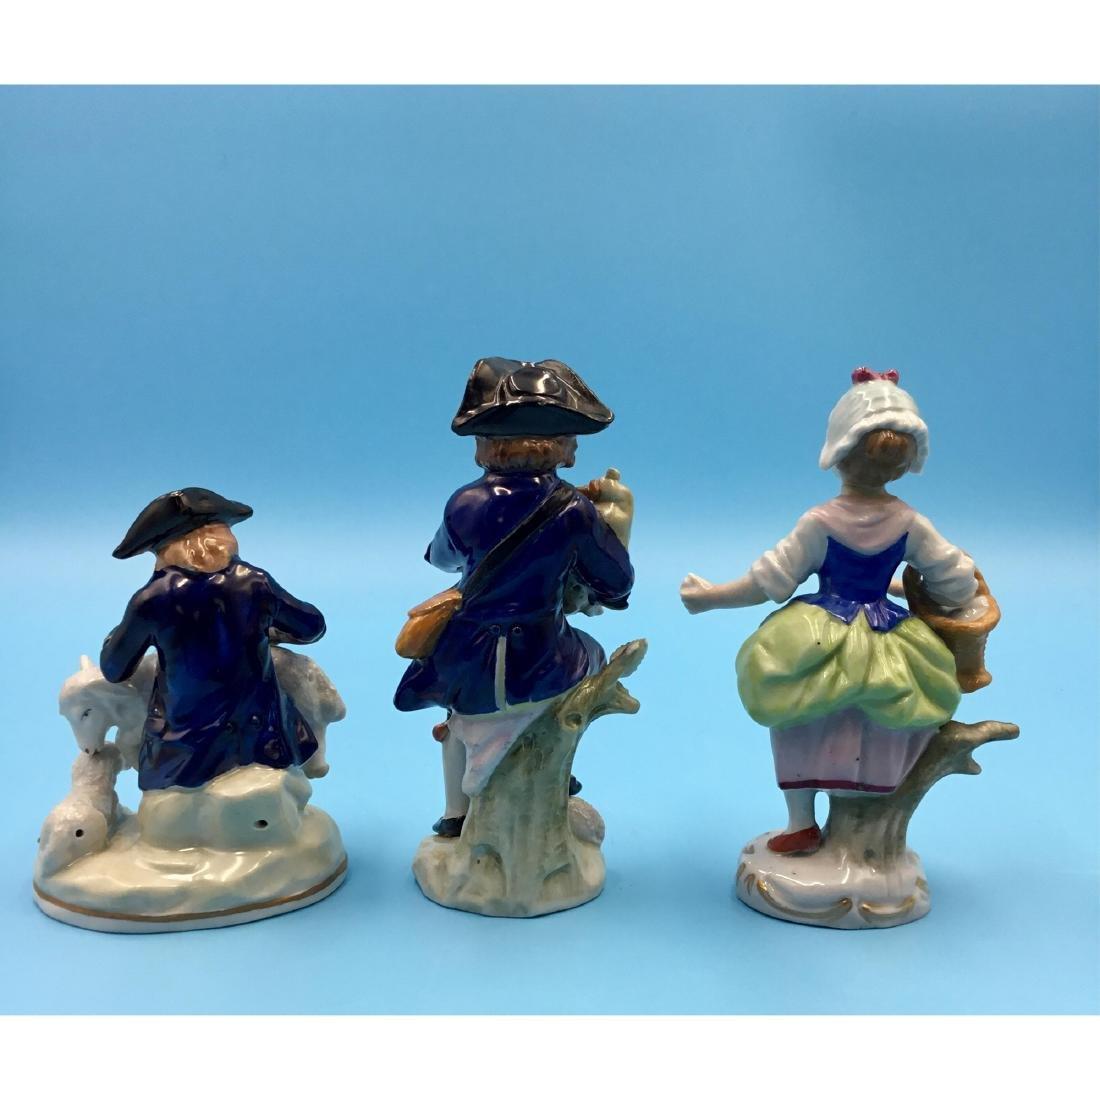 GROUP OF 3 SITZENDORF GERMAN PORCELAIN FIGURINES - 3